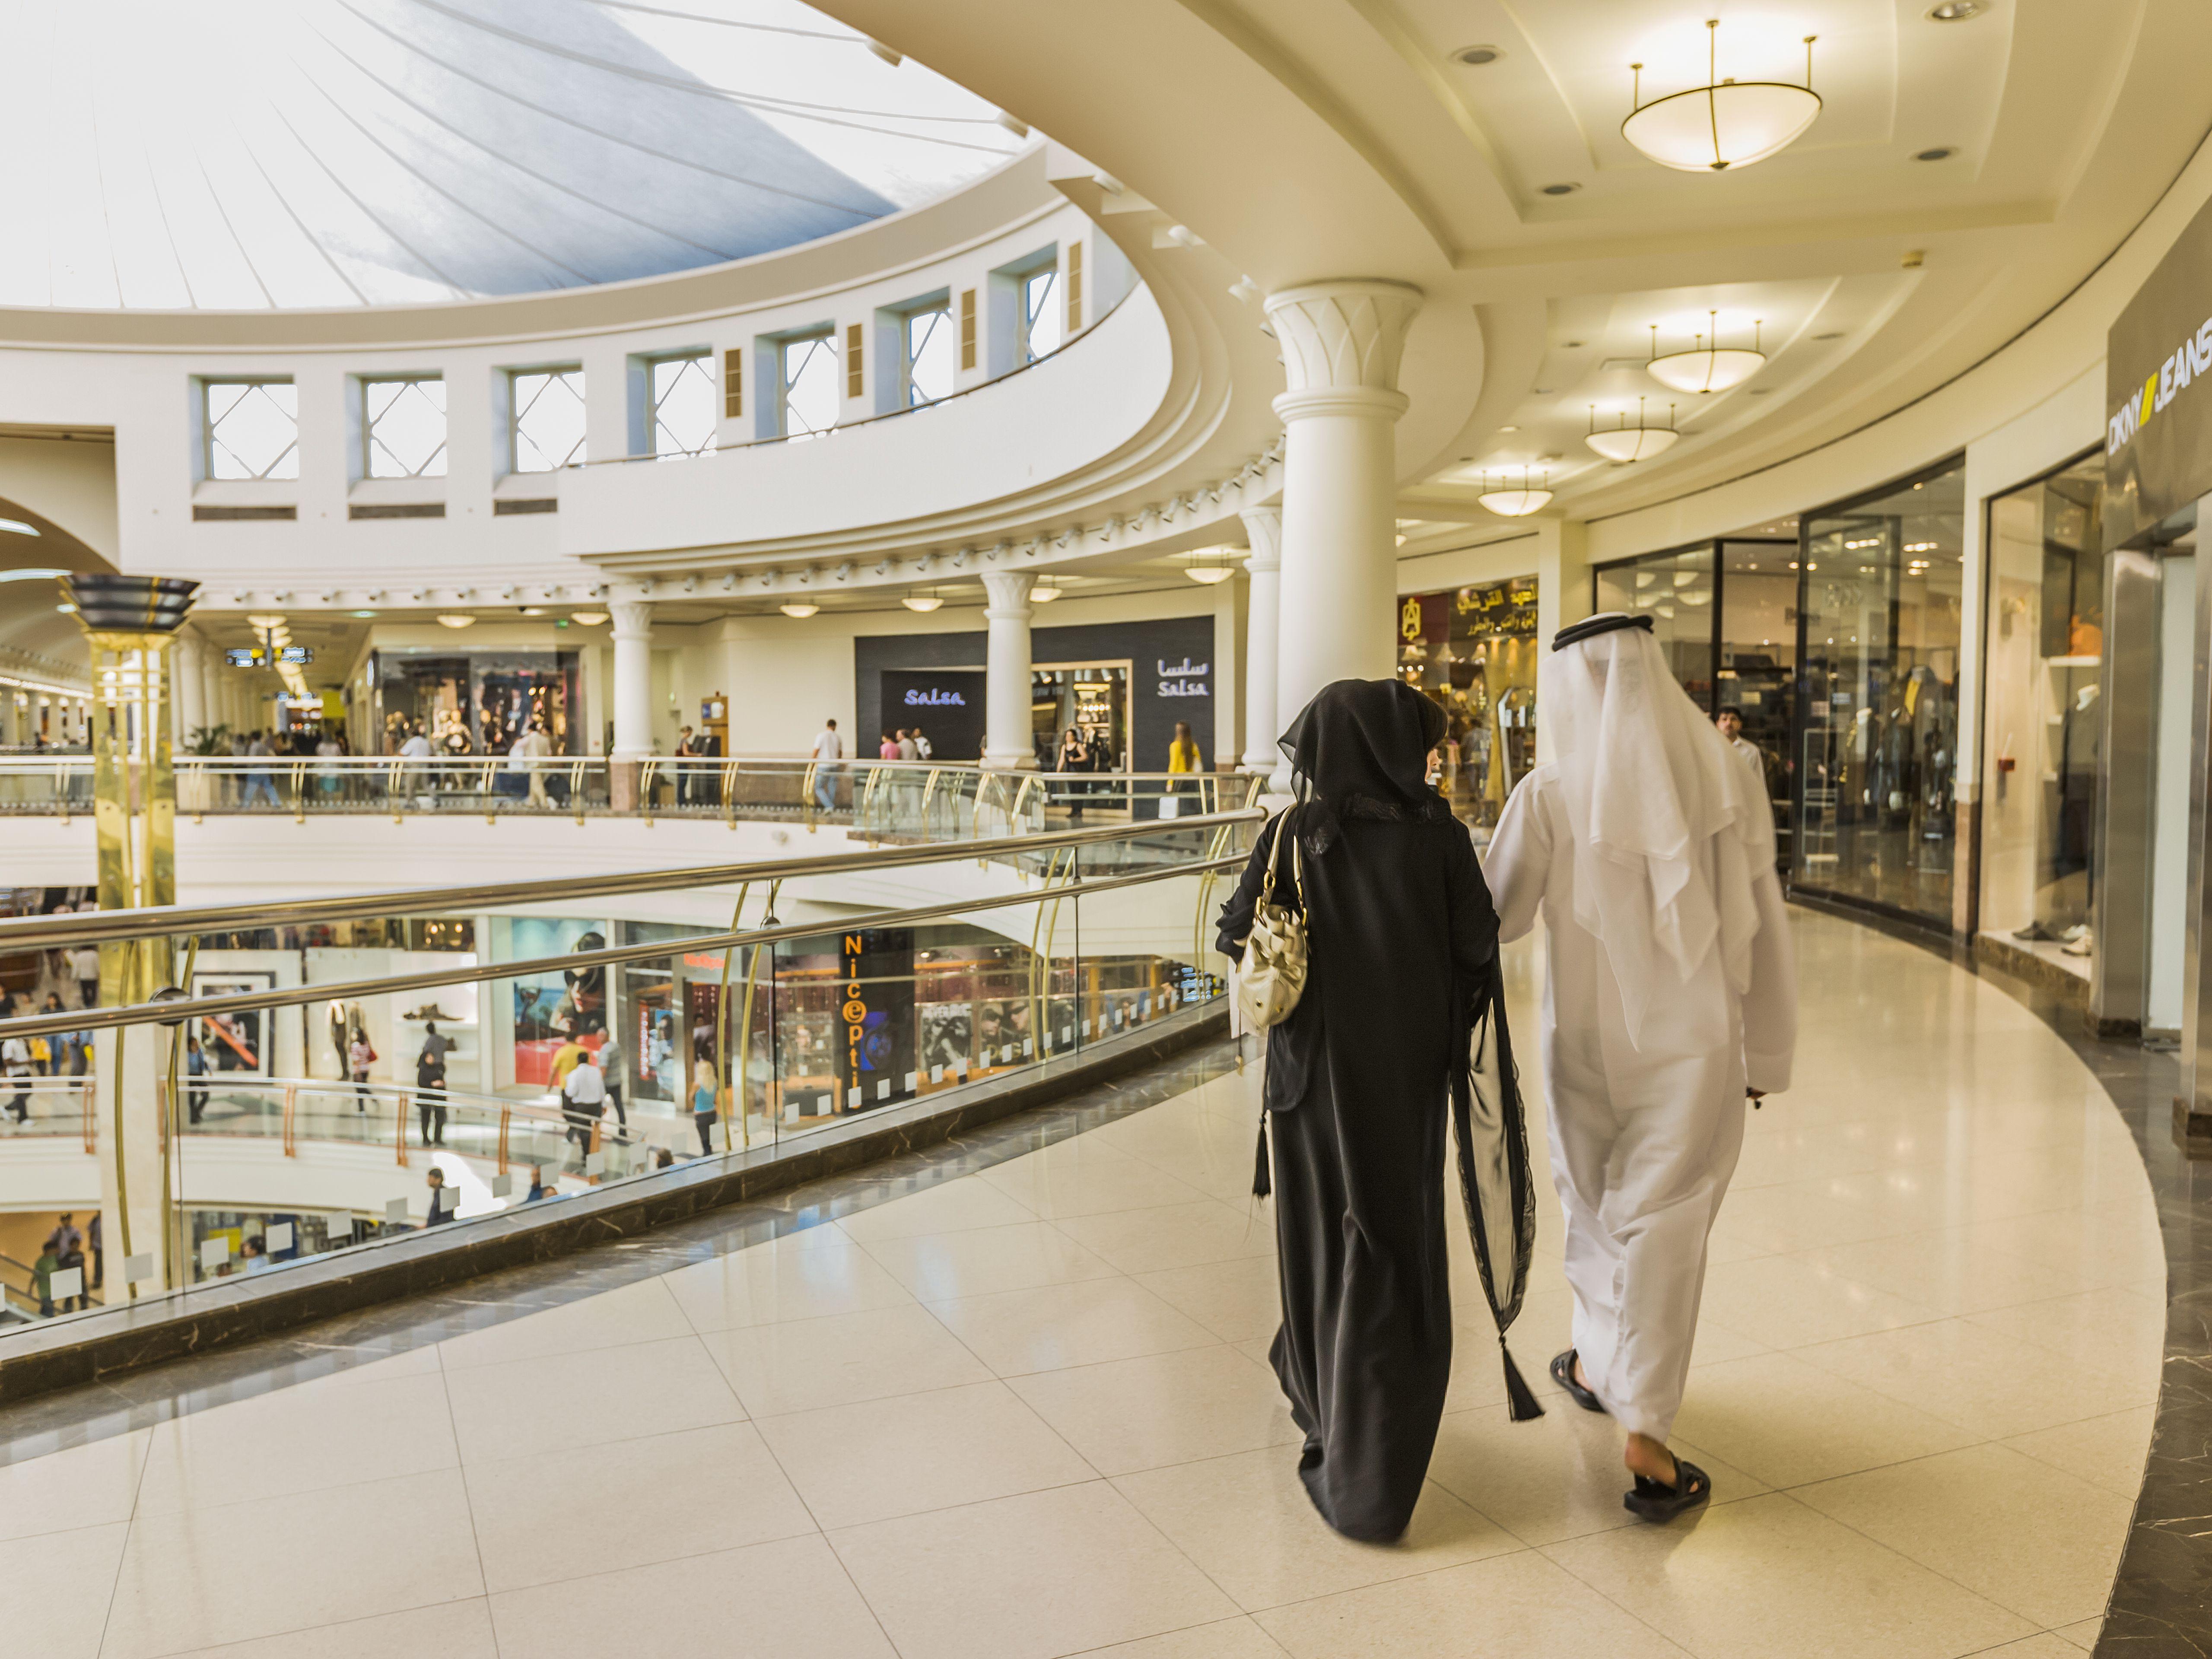 What Female Travelers Should Wear in Muslim Countries